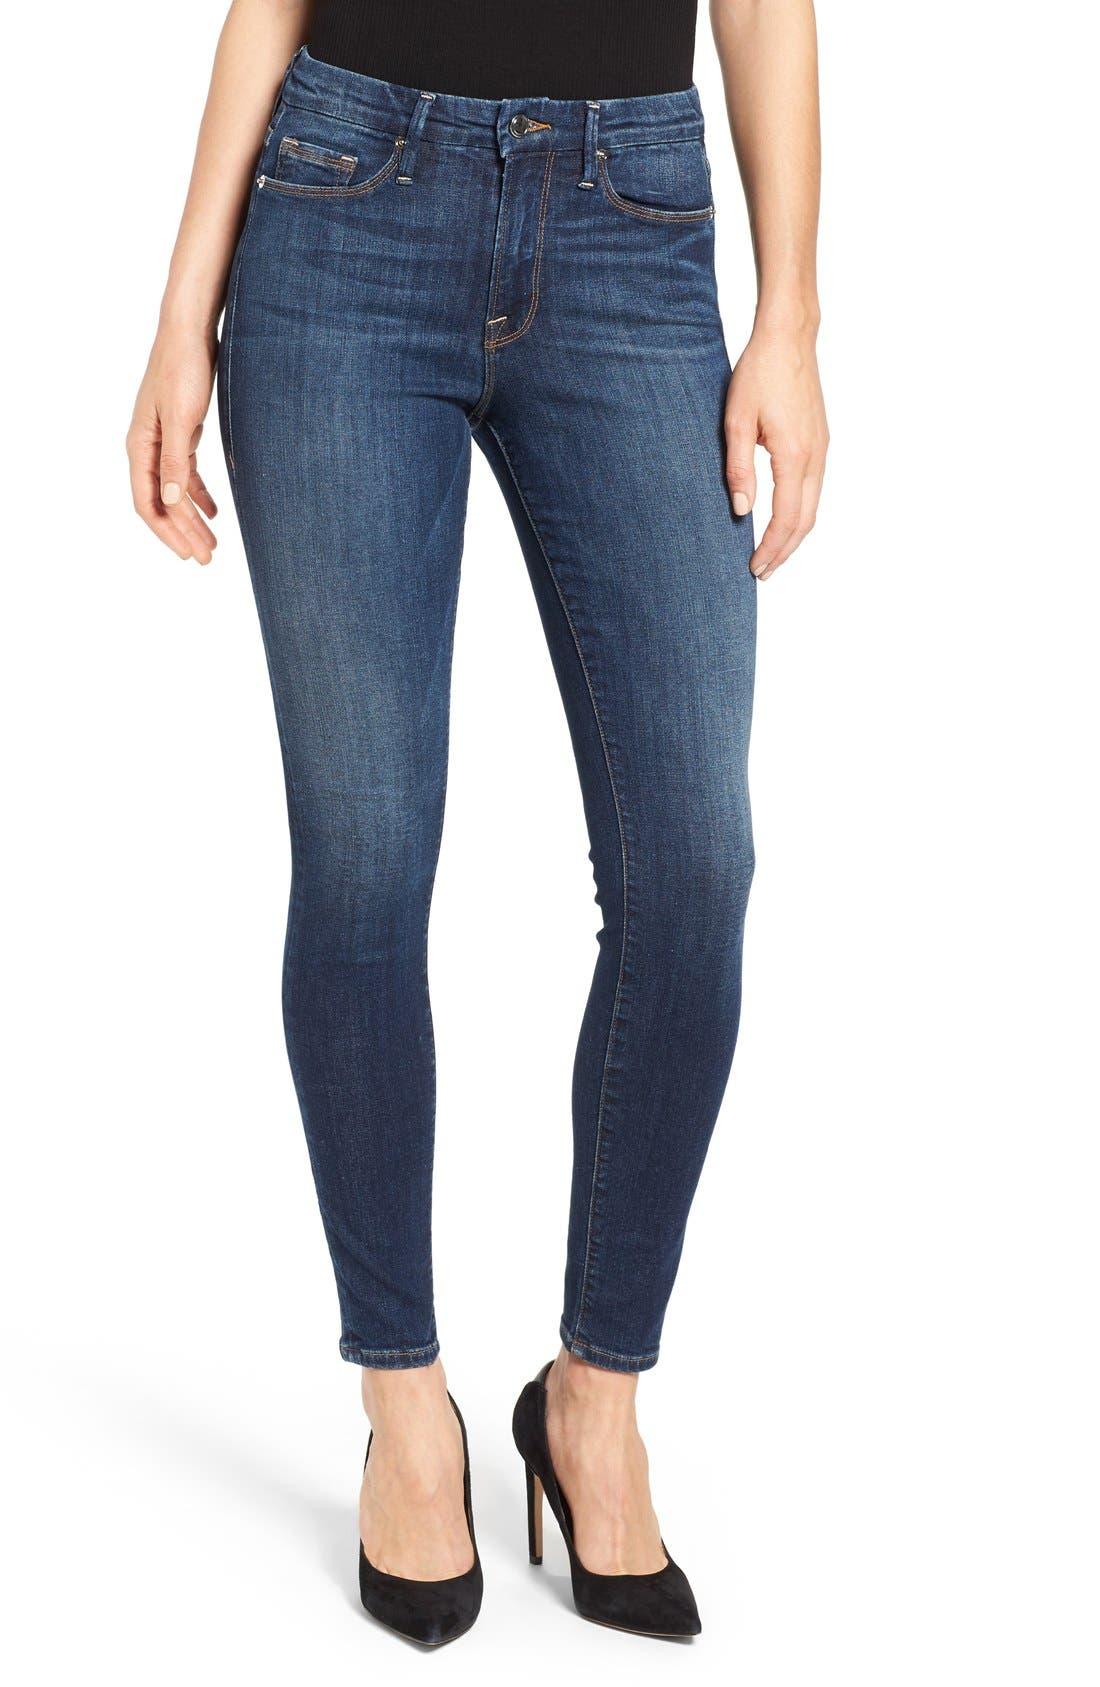 Main Image - Good American Good Legs High Rise Skinny Jeans (Blue 004)